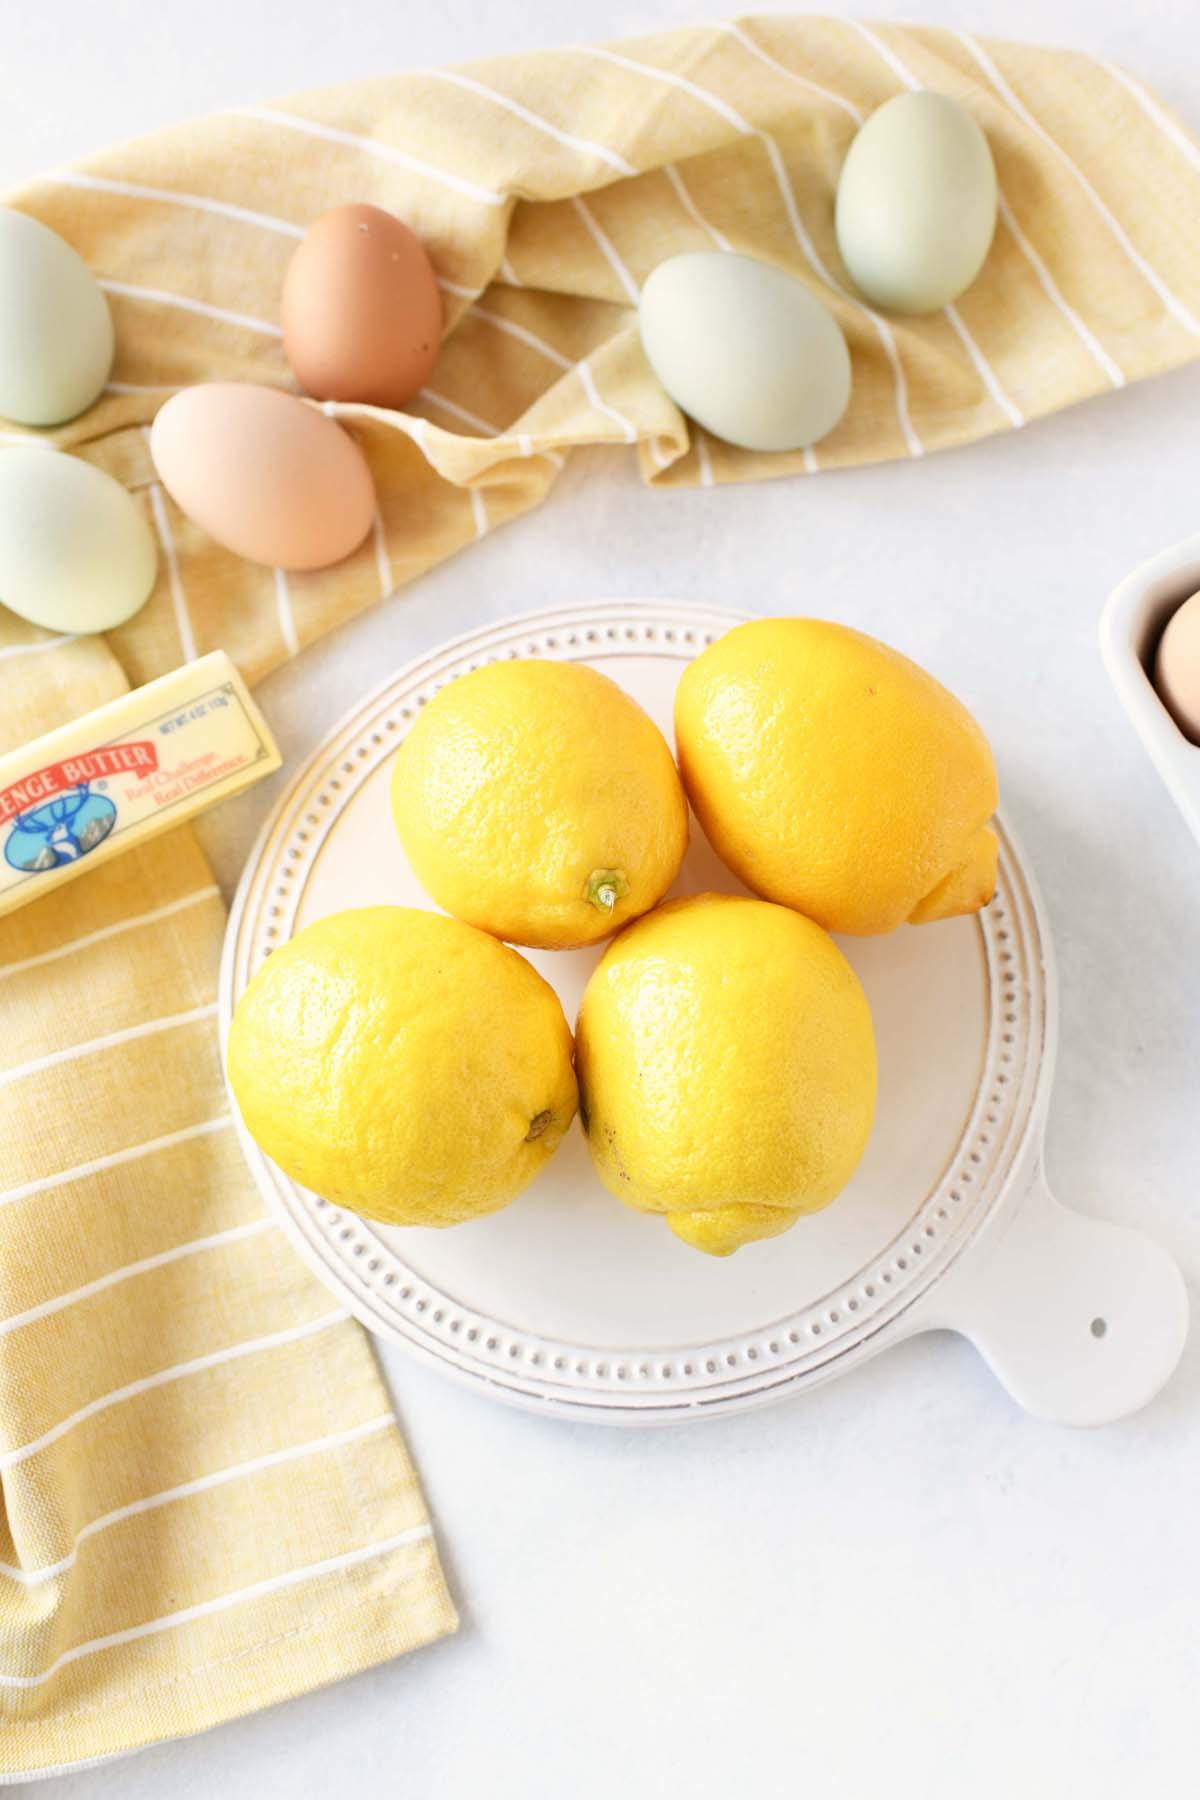 Fresh lemon curd ingredients like eggs, butter, and lemons on a white table.